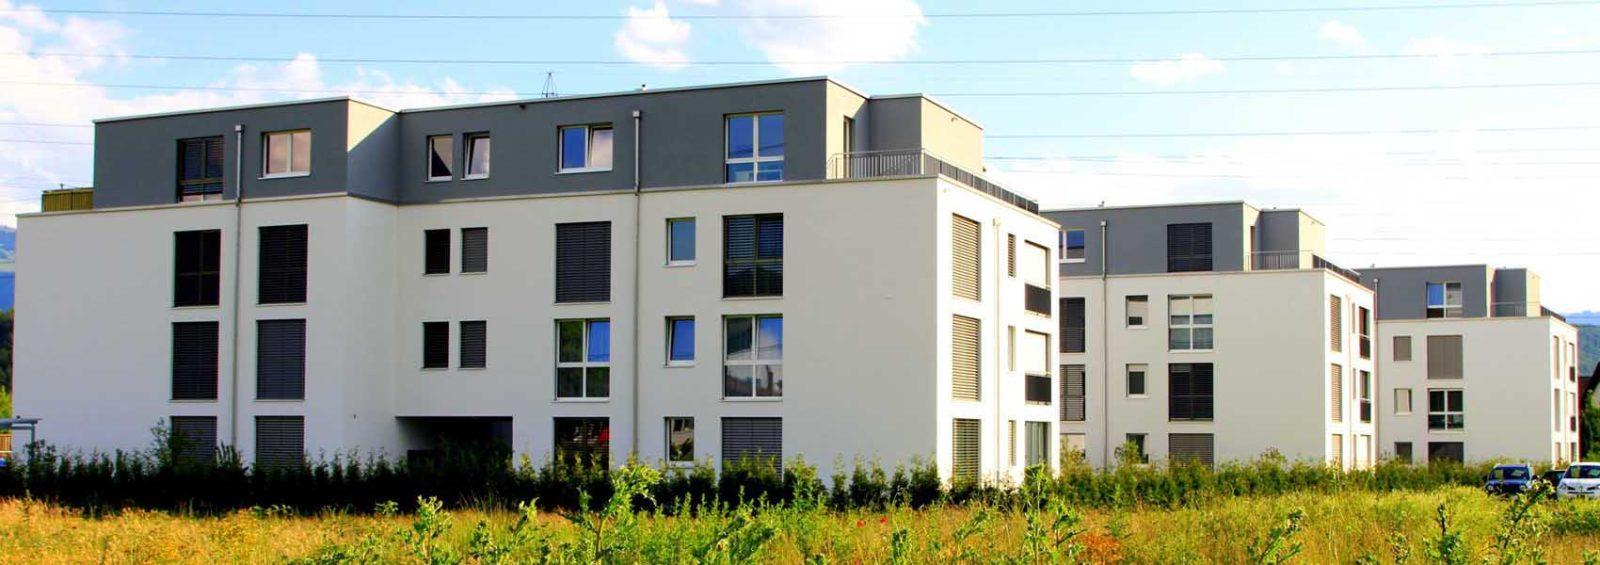 sonnenpark_600